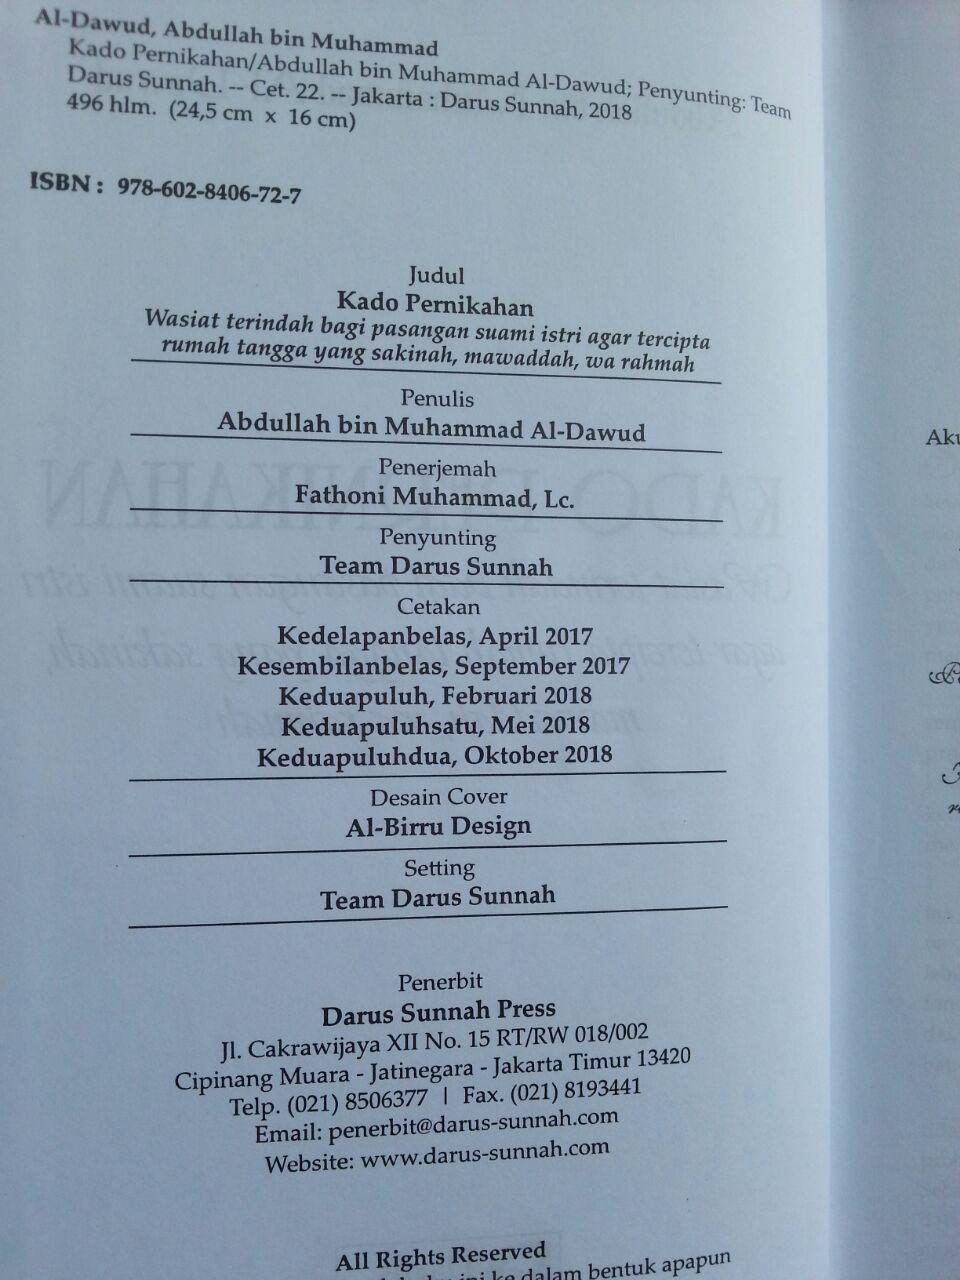 Buku Kado Pernikahan isi 3